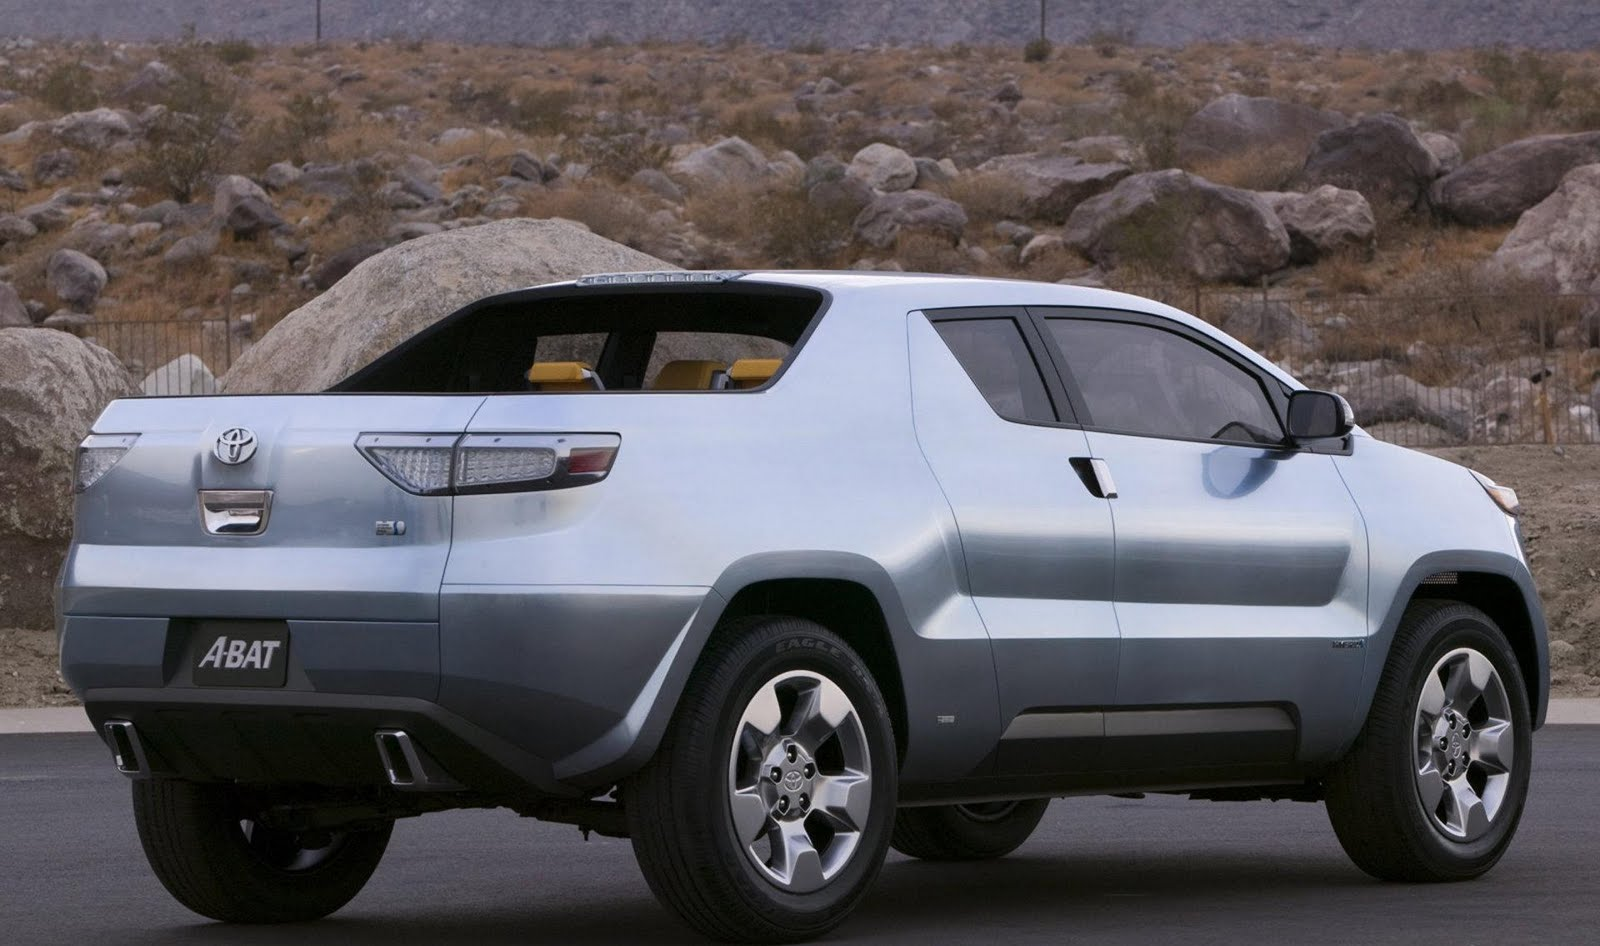 like the Honda Ridgeline, Nissan Frontier, and Toyota Tacoma